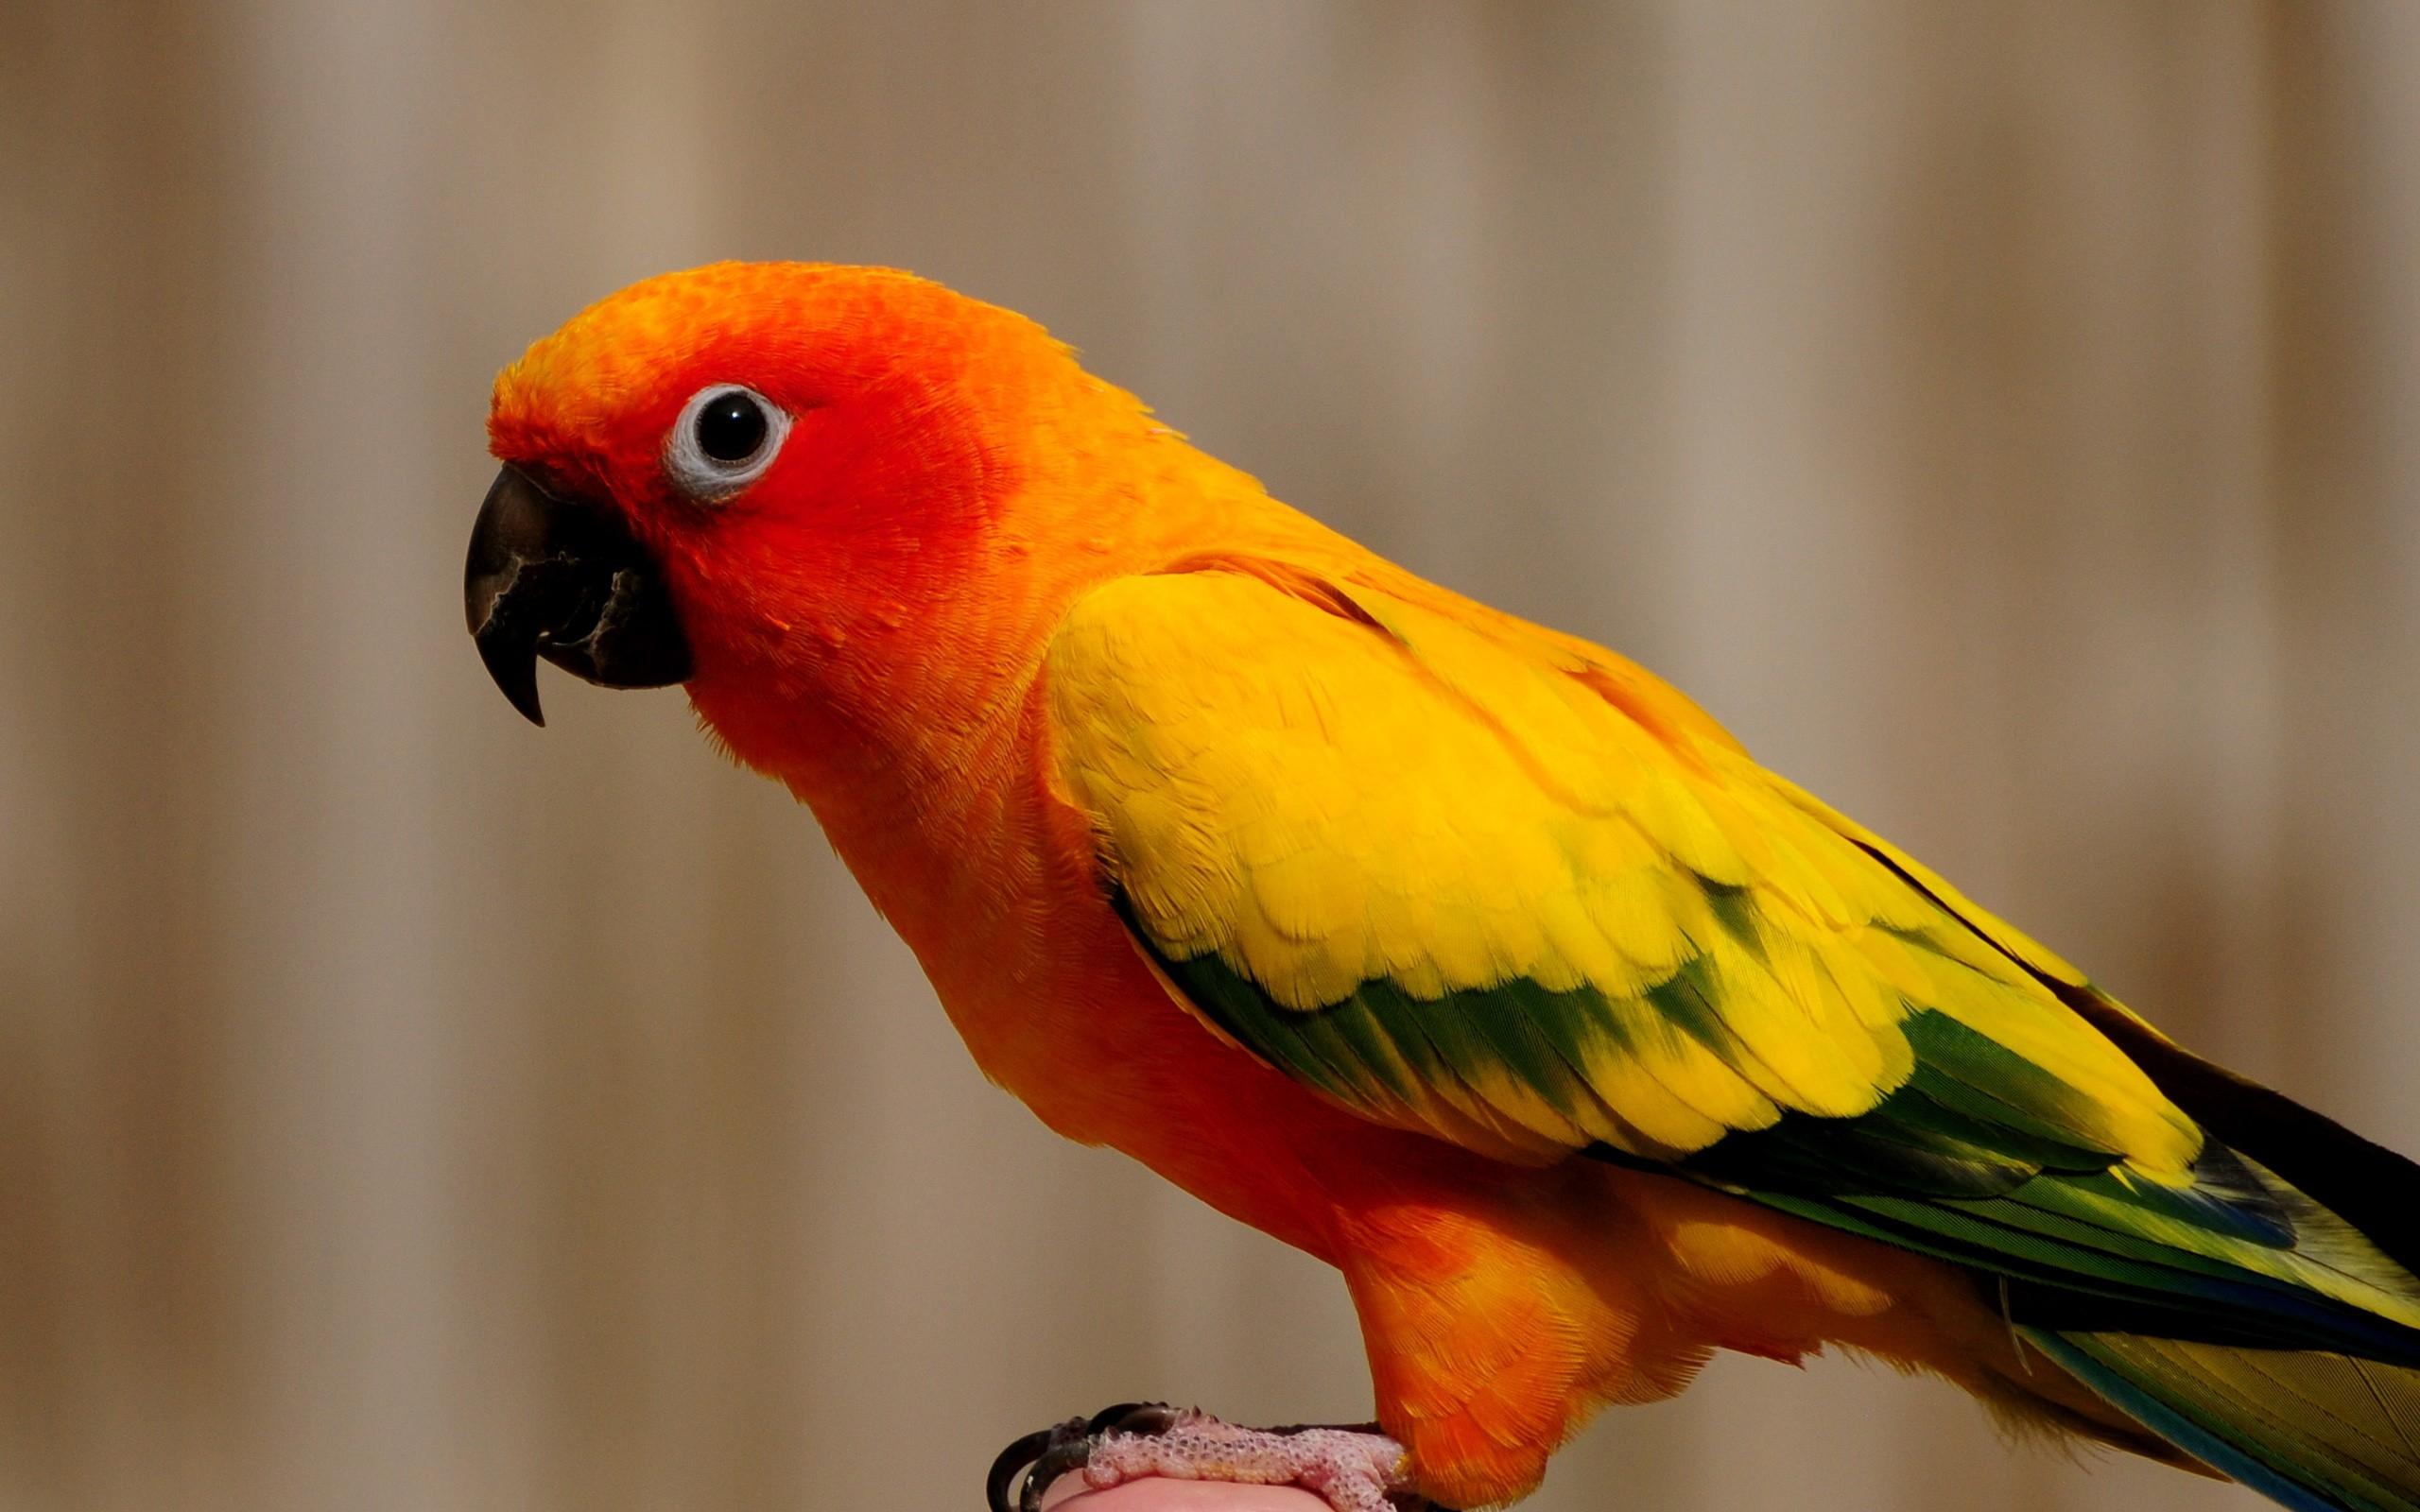 colorful bird up close wallpaper 43149